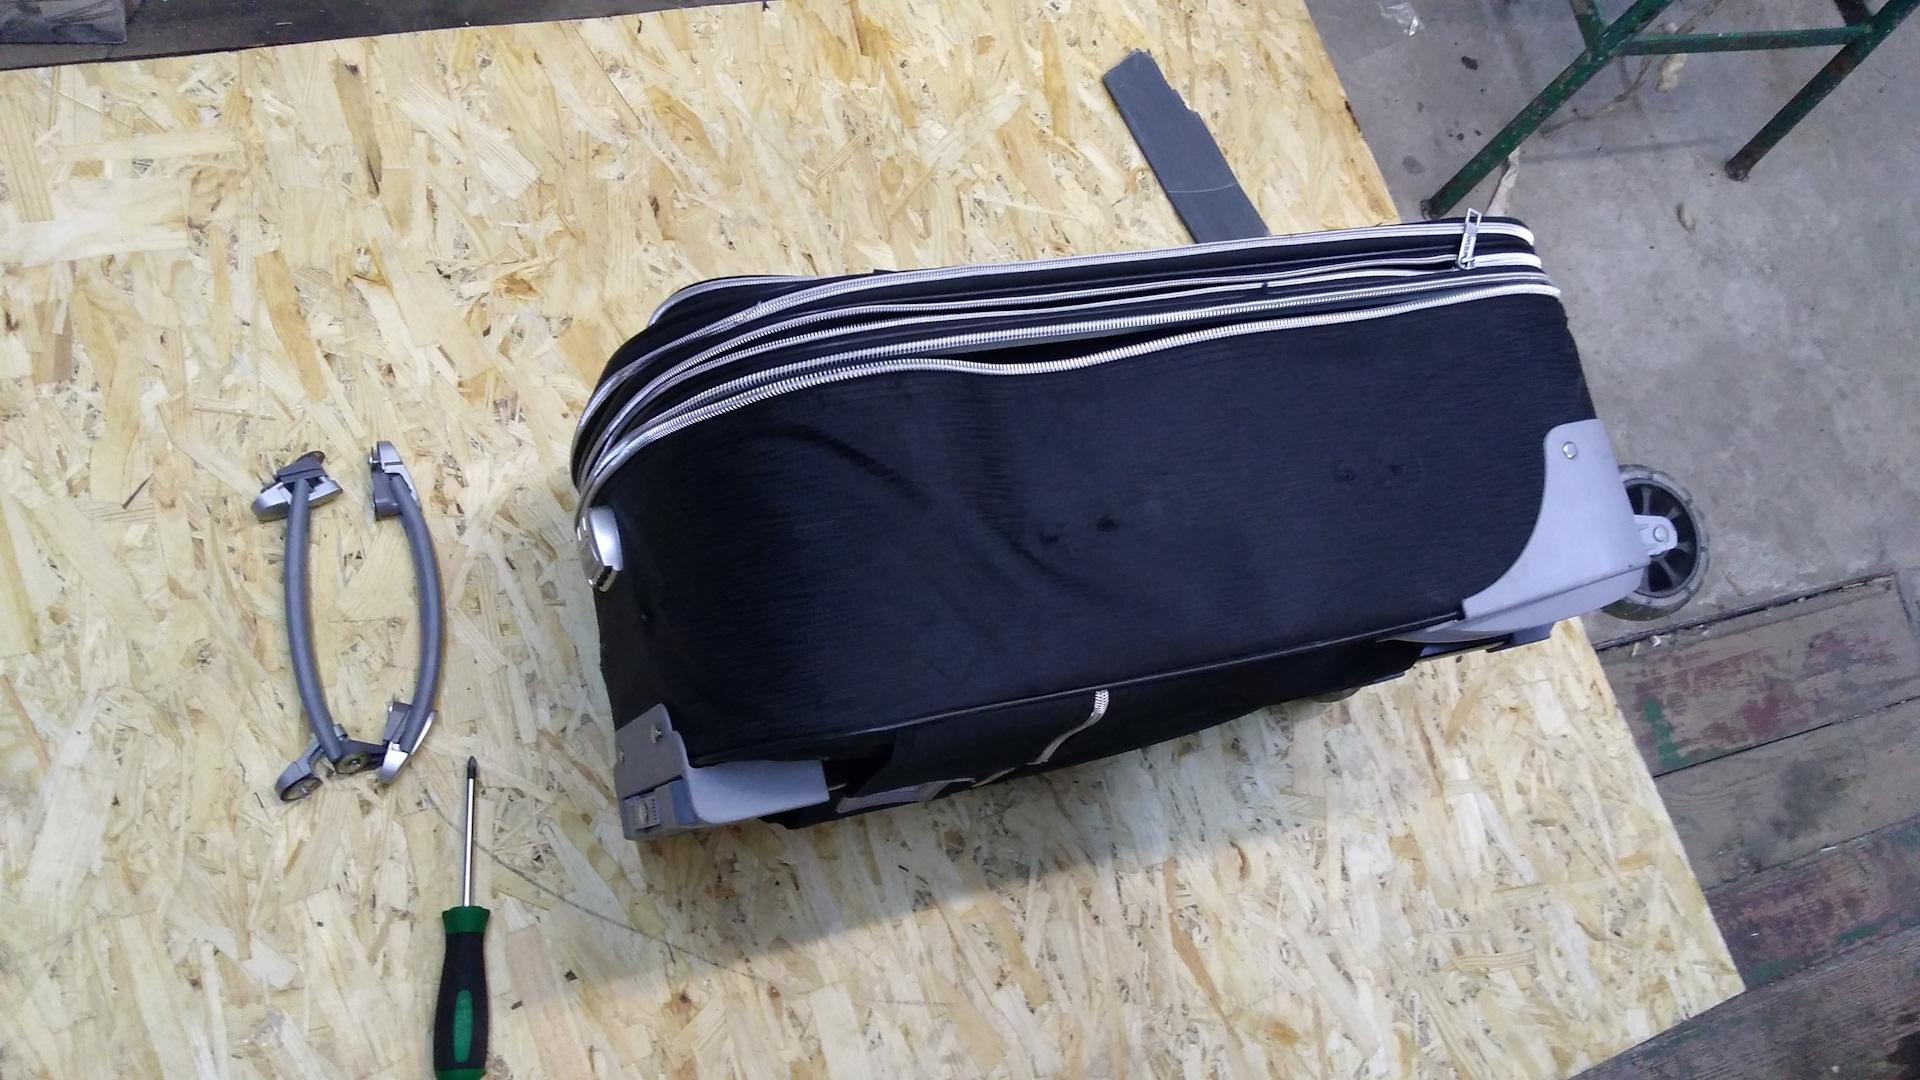 Ремонт ручки чемодана своими руками фото 979